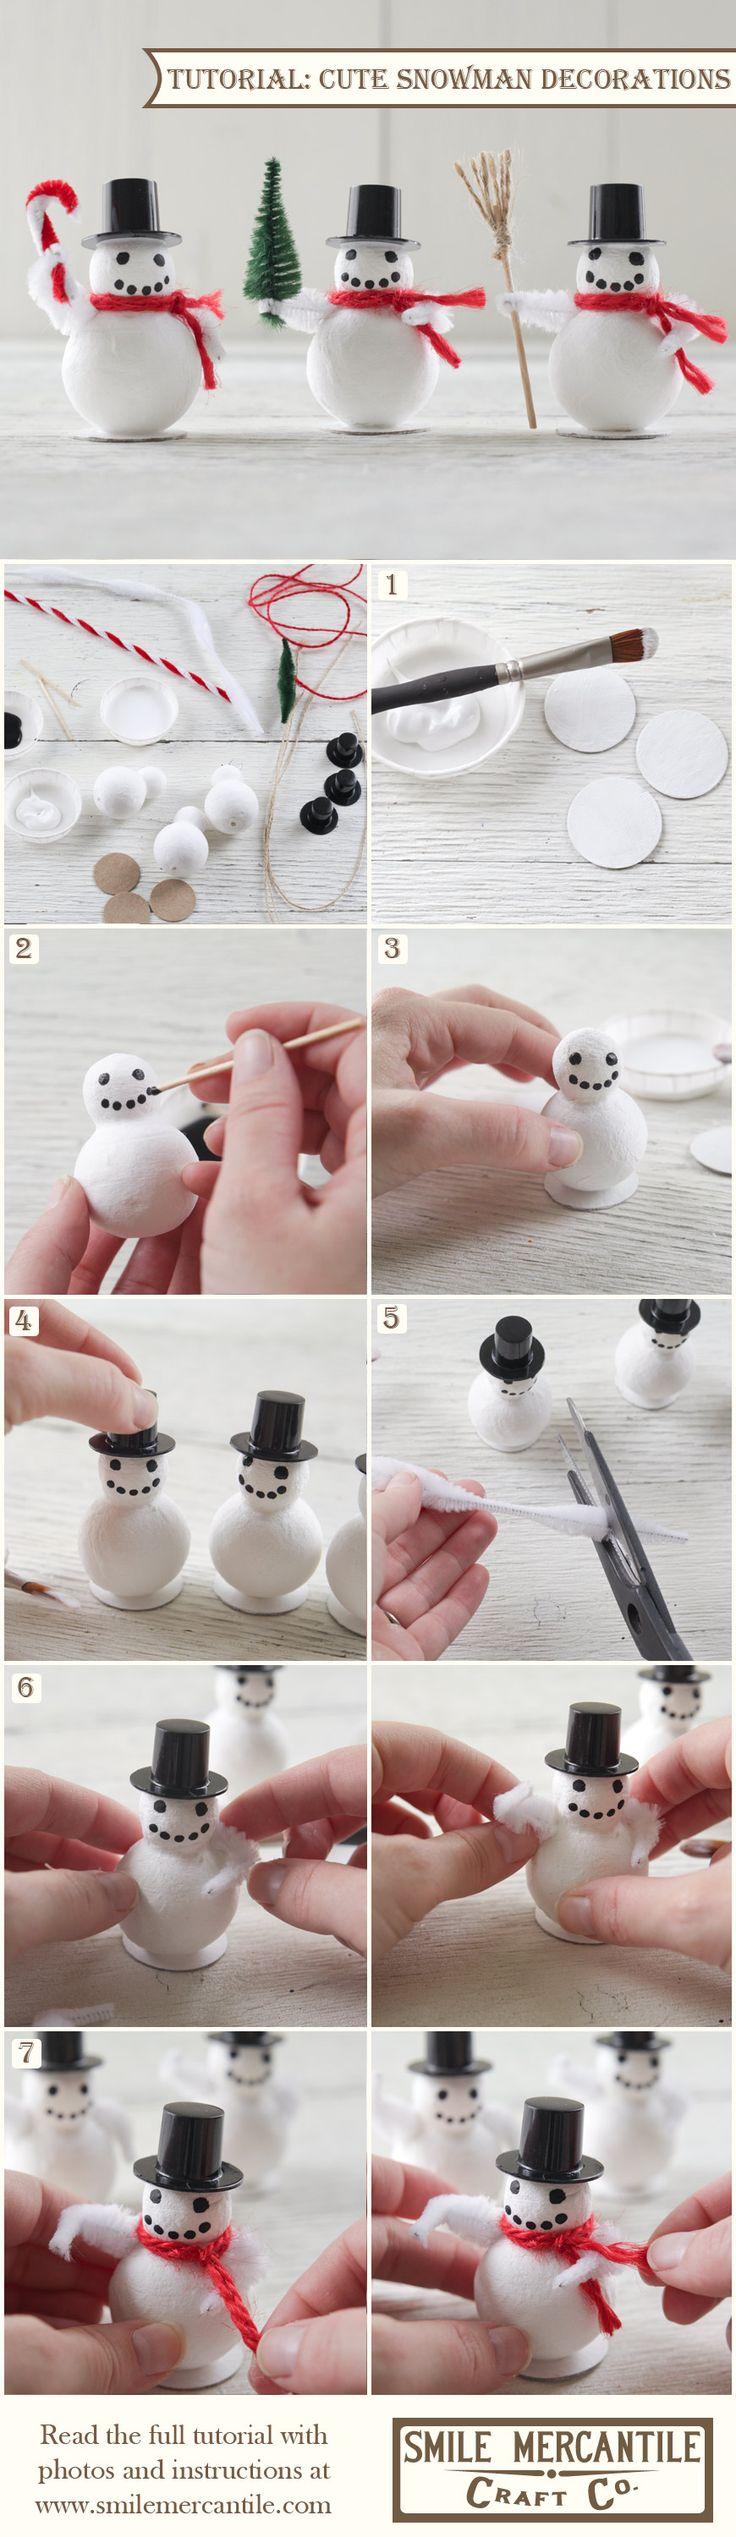 Tutorial: Cute Spun Cotton Snowman Decorations with Chipboard Hats